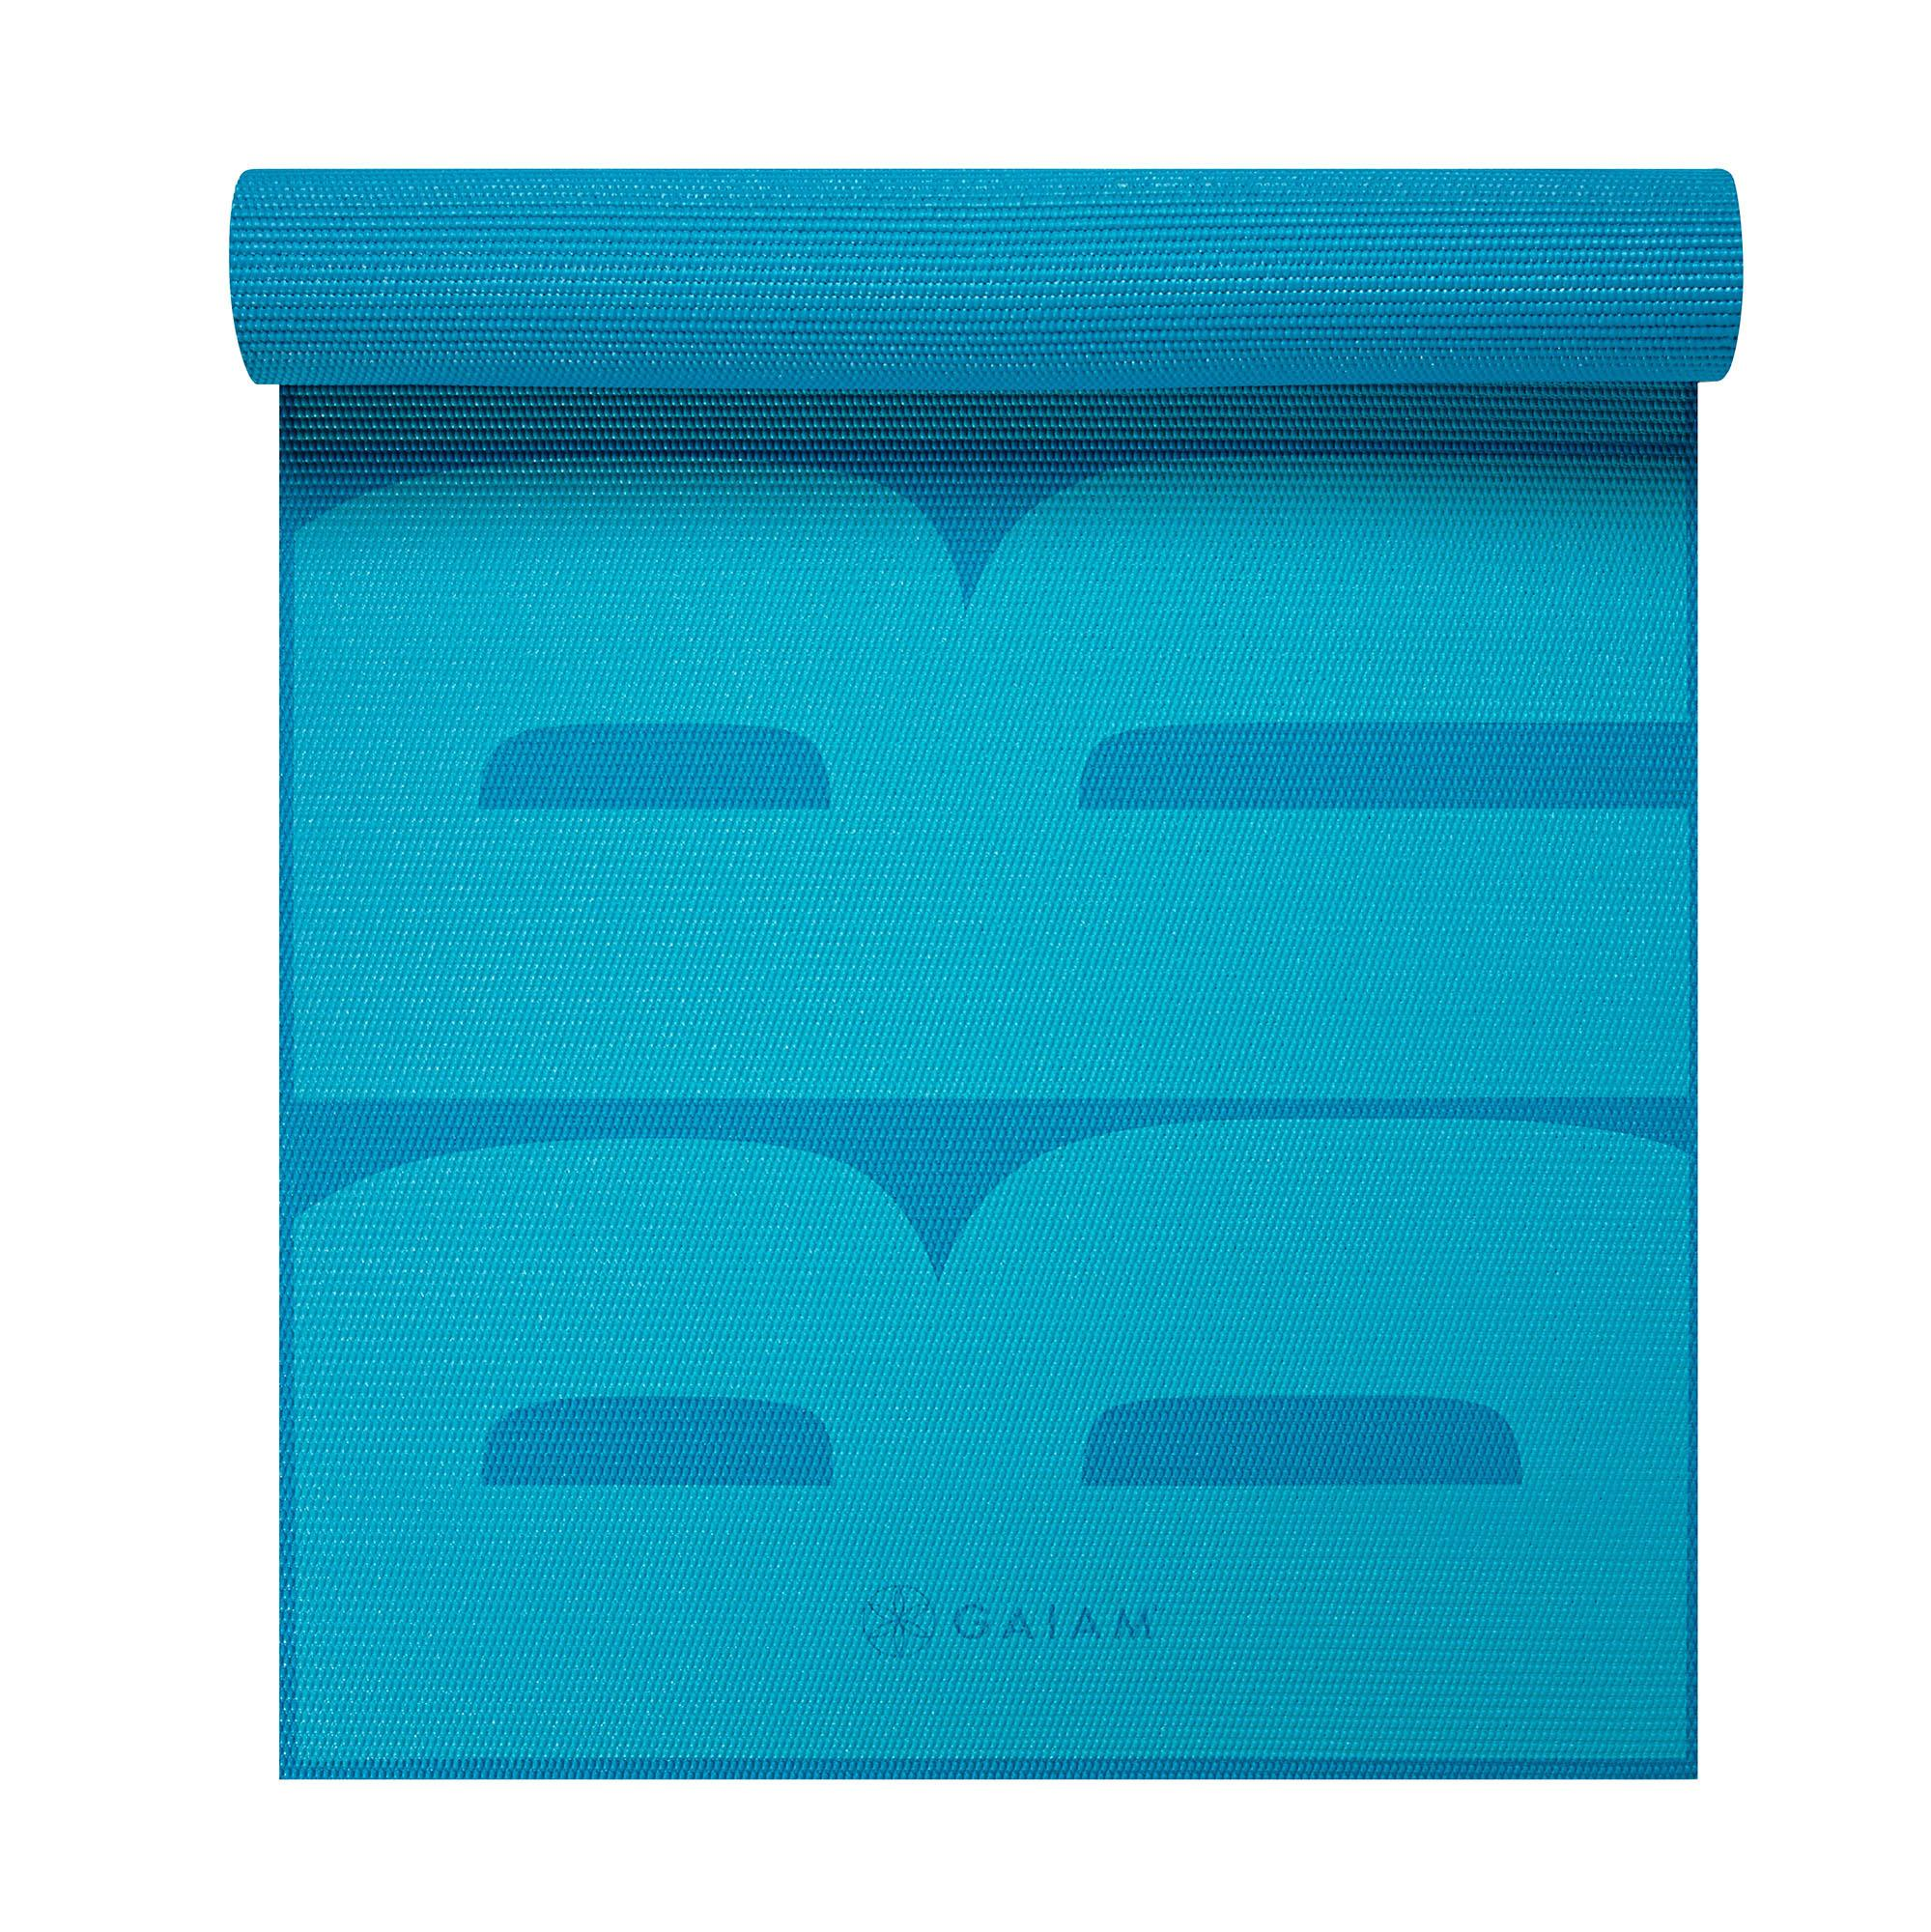 Amazon.com : Gaiam Print Premium Yoga Mats (5mm) : Sports